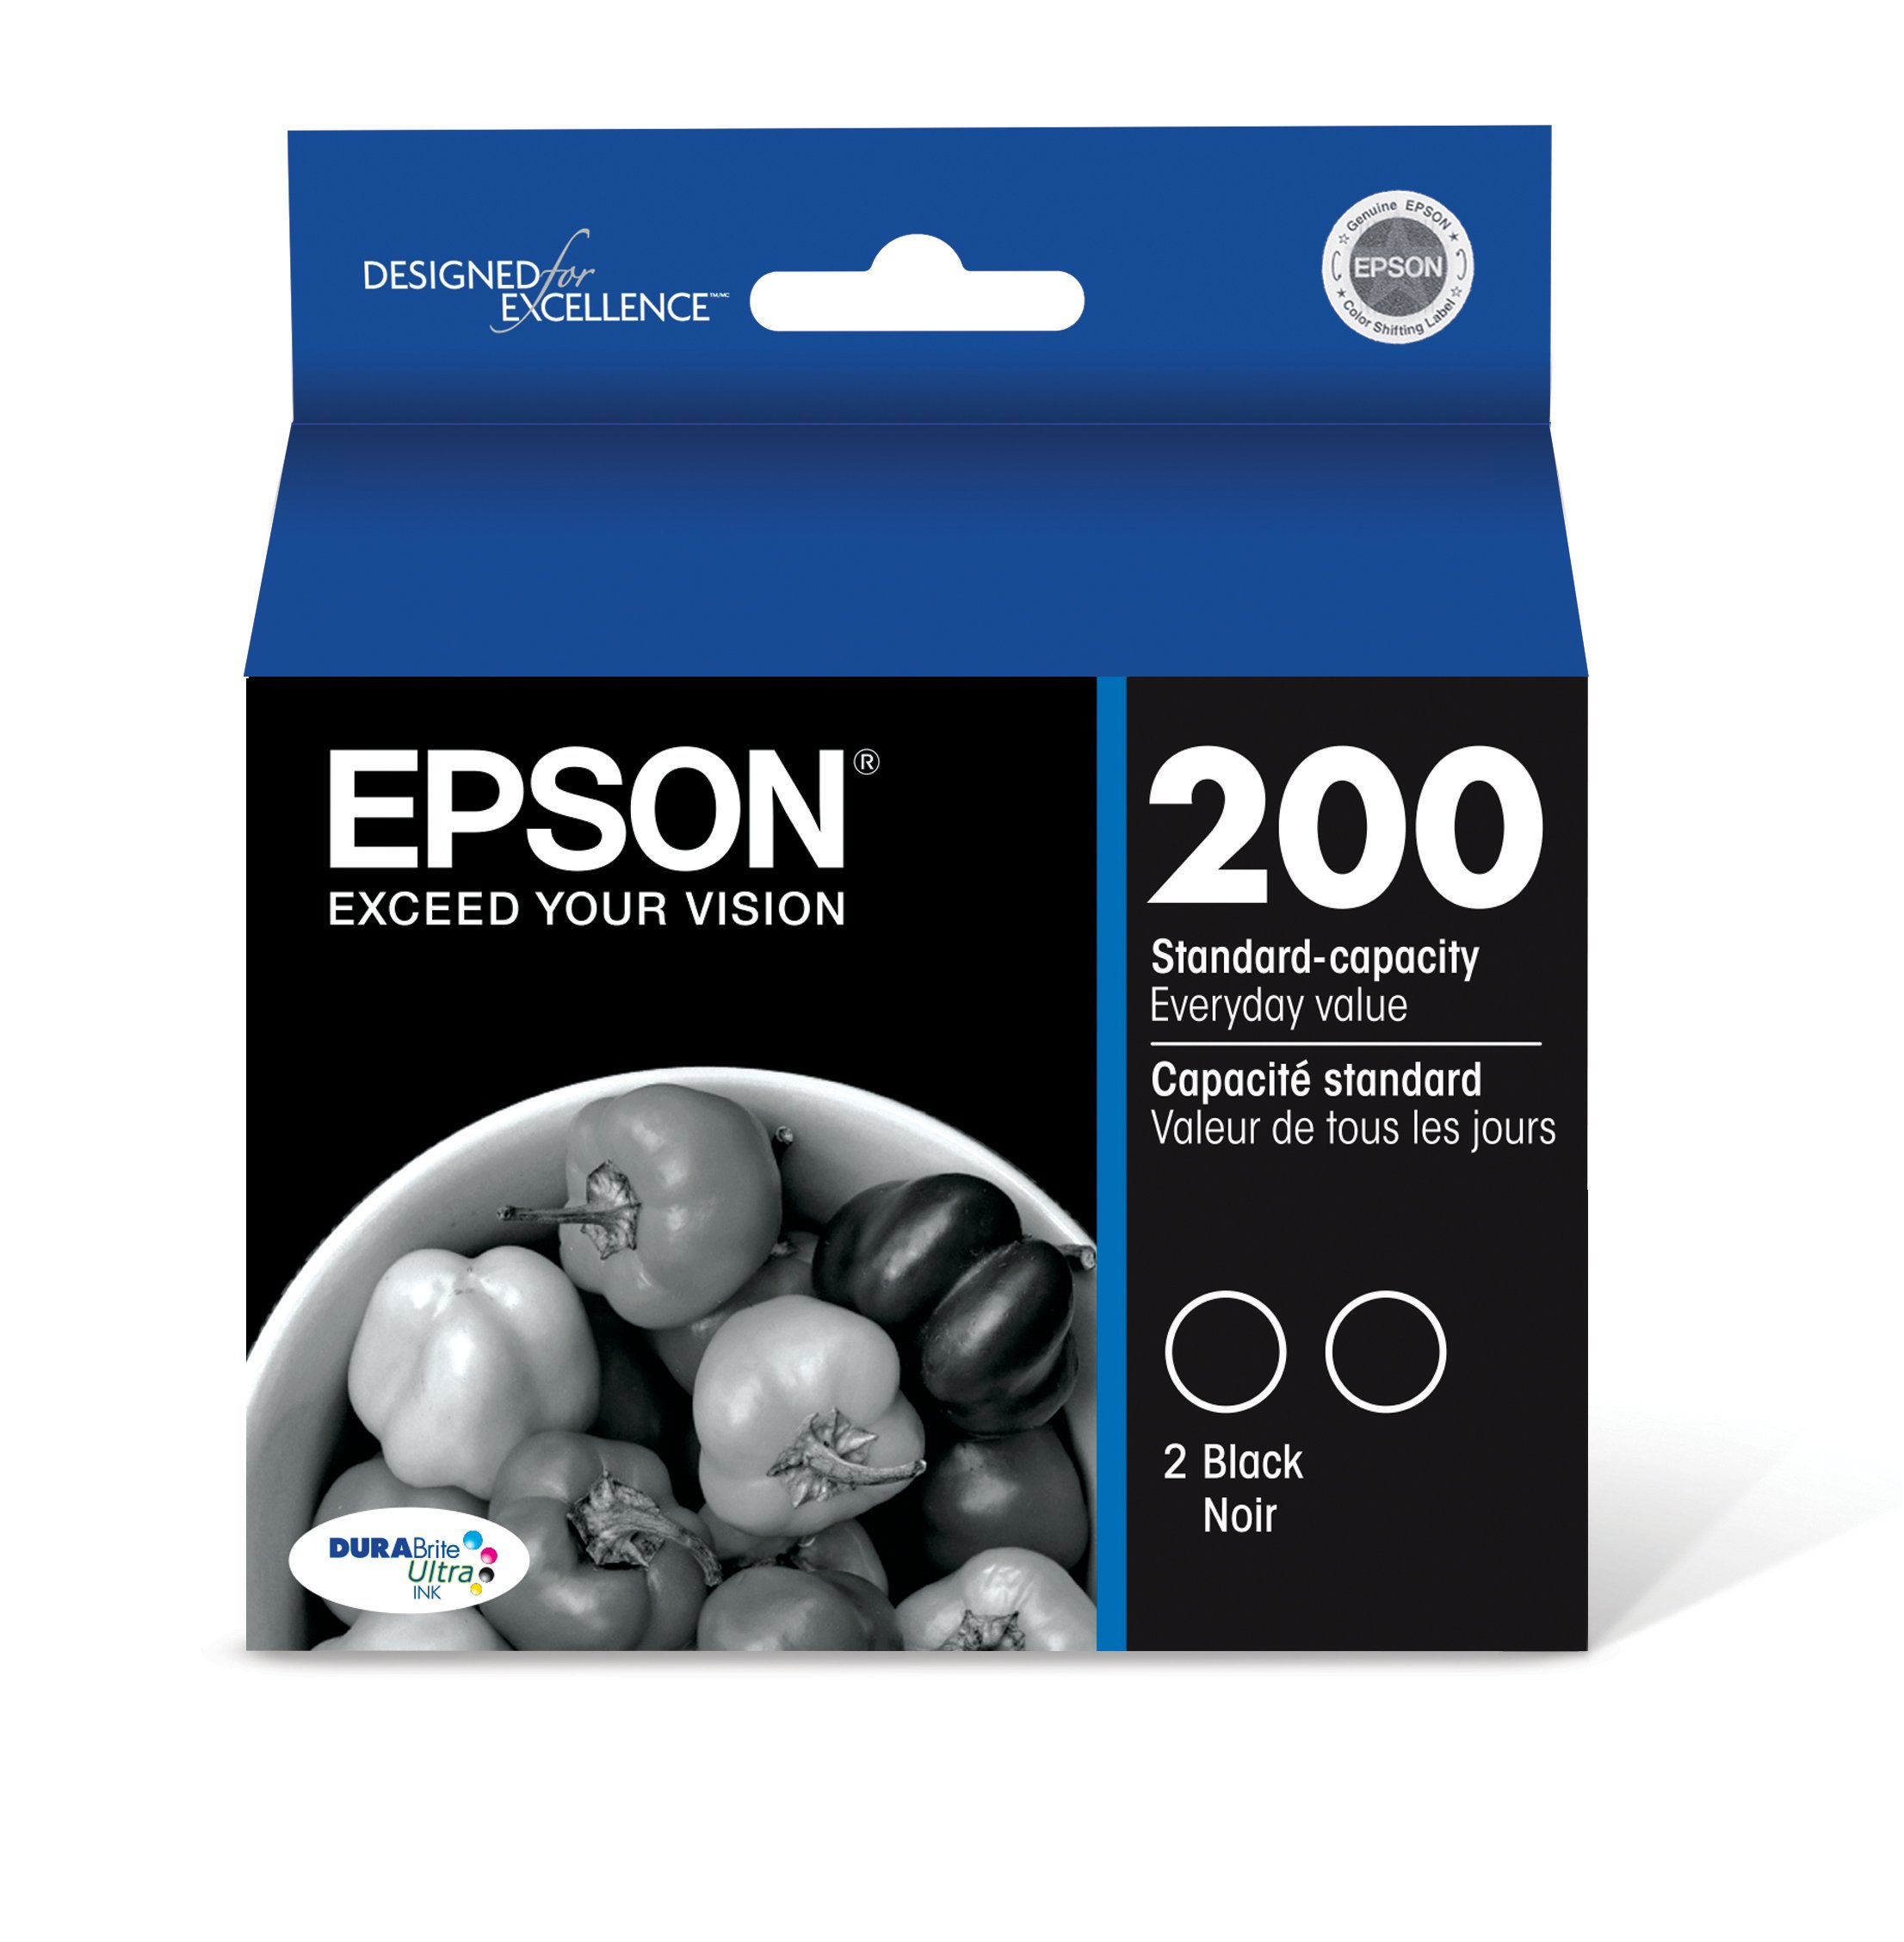 Epson T200120-D2 DURABrite Ultra Black Dual Pack Standard Capacity Cartridge Ink